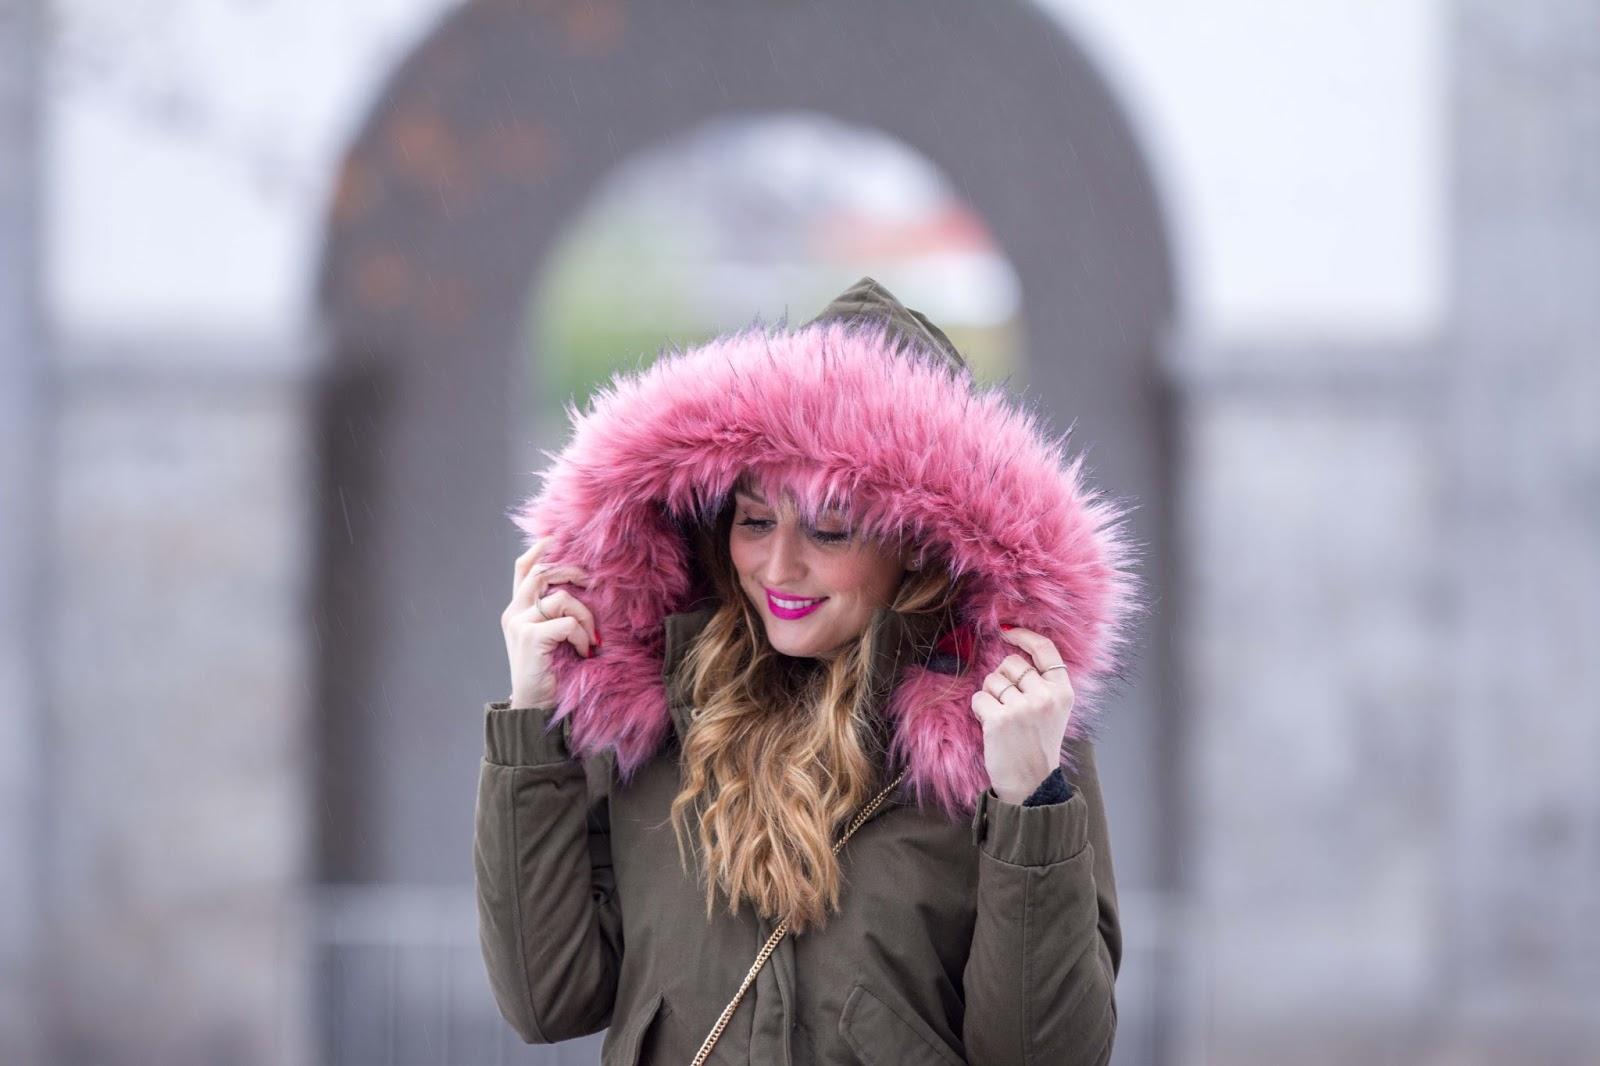 Fashionblogger-Parka-Parka-mit-buntem-Fell-pinkes-Fell-Khaki-Parka-Bloggerstyle-Fashionstylebyjohanna